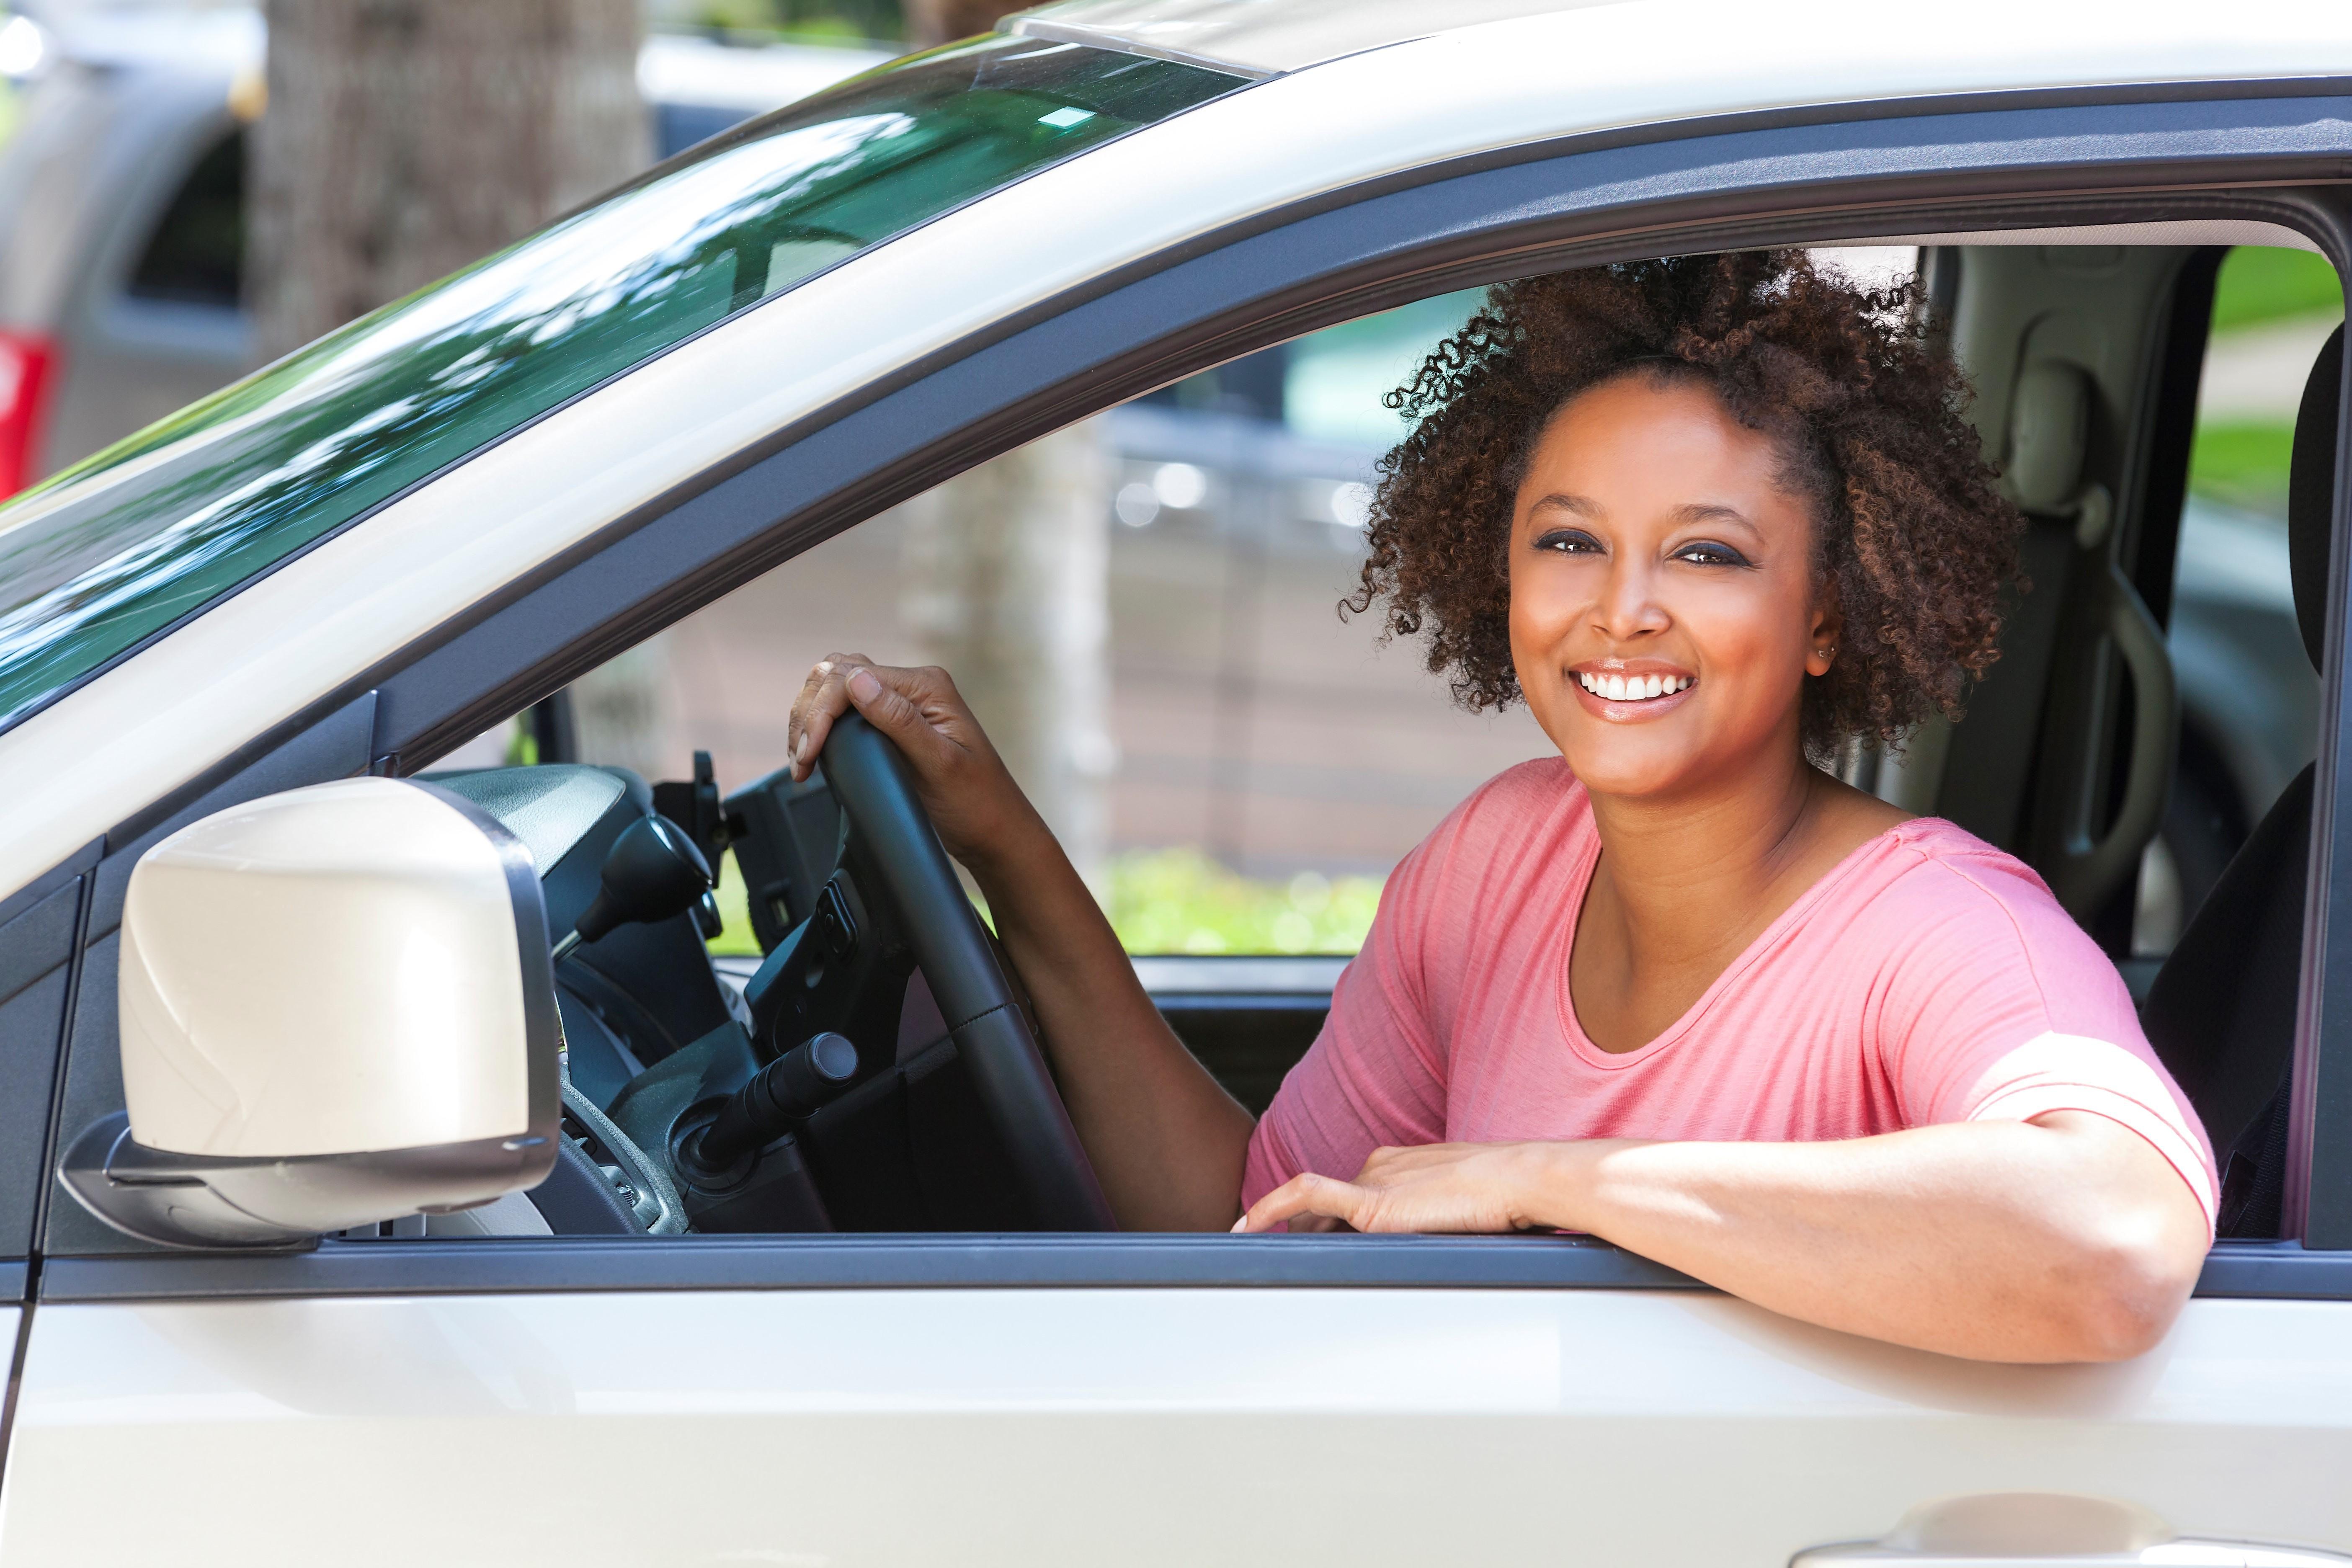 Union County Cancer Prevention Drive-thru